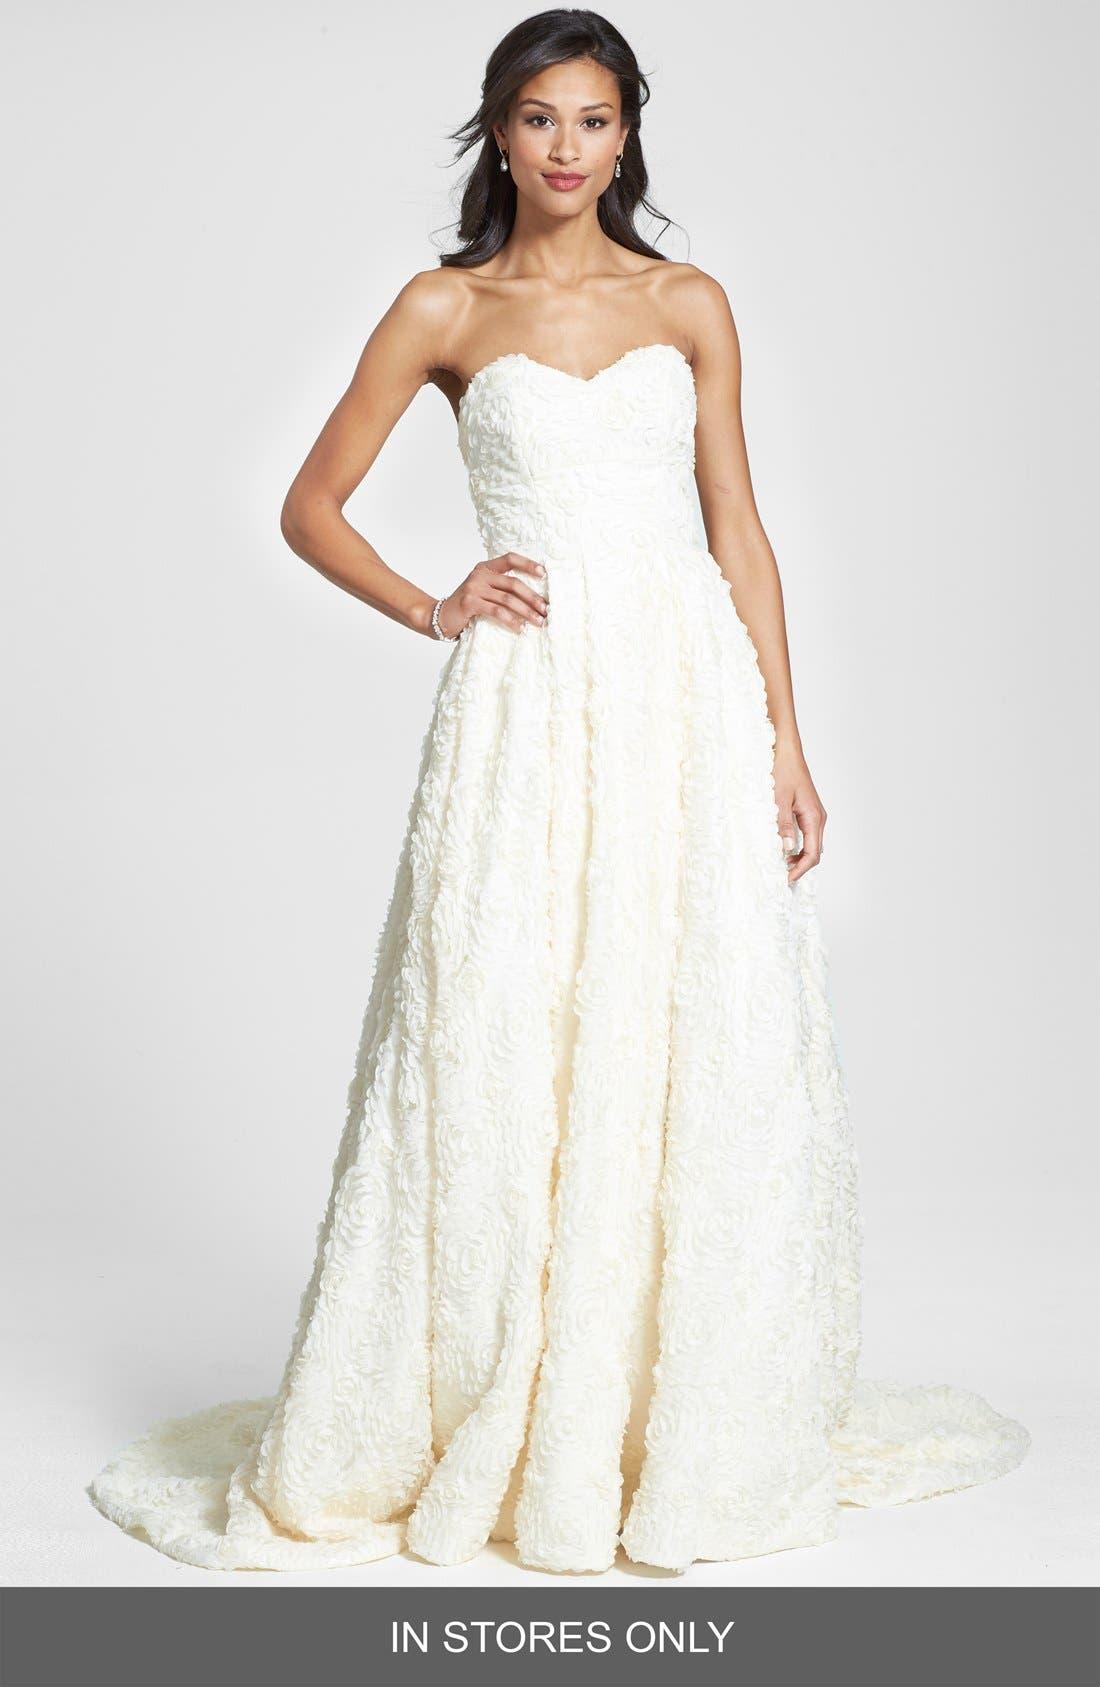 Main Image - Olia Zavozina 'Delia' Rosette Silk Blend Lace Chiffon Dress (In Stores Only)